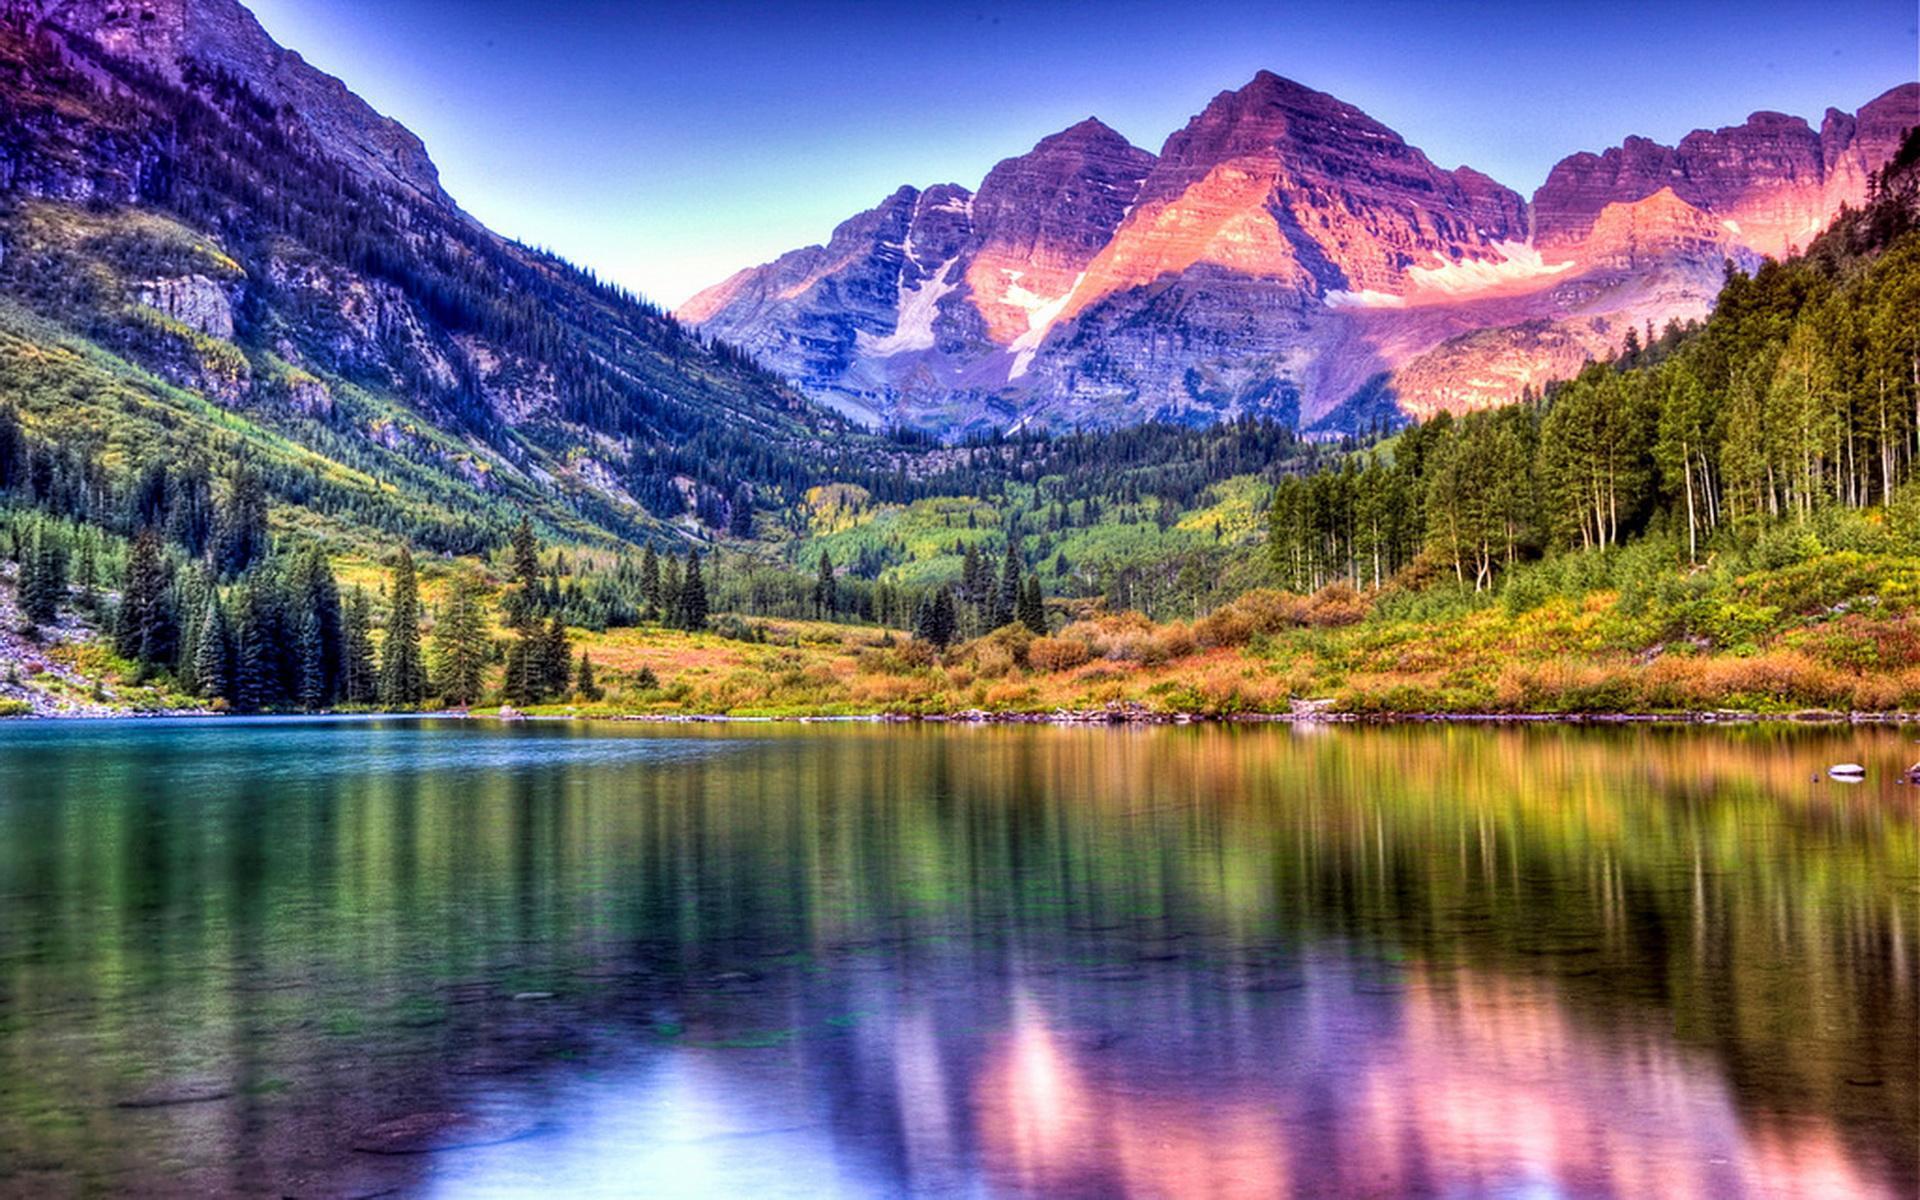 Maroon Bells Lake at Sunrise Colorado HQ Wallpaper